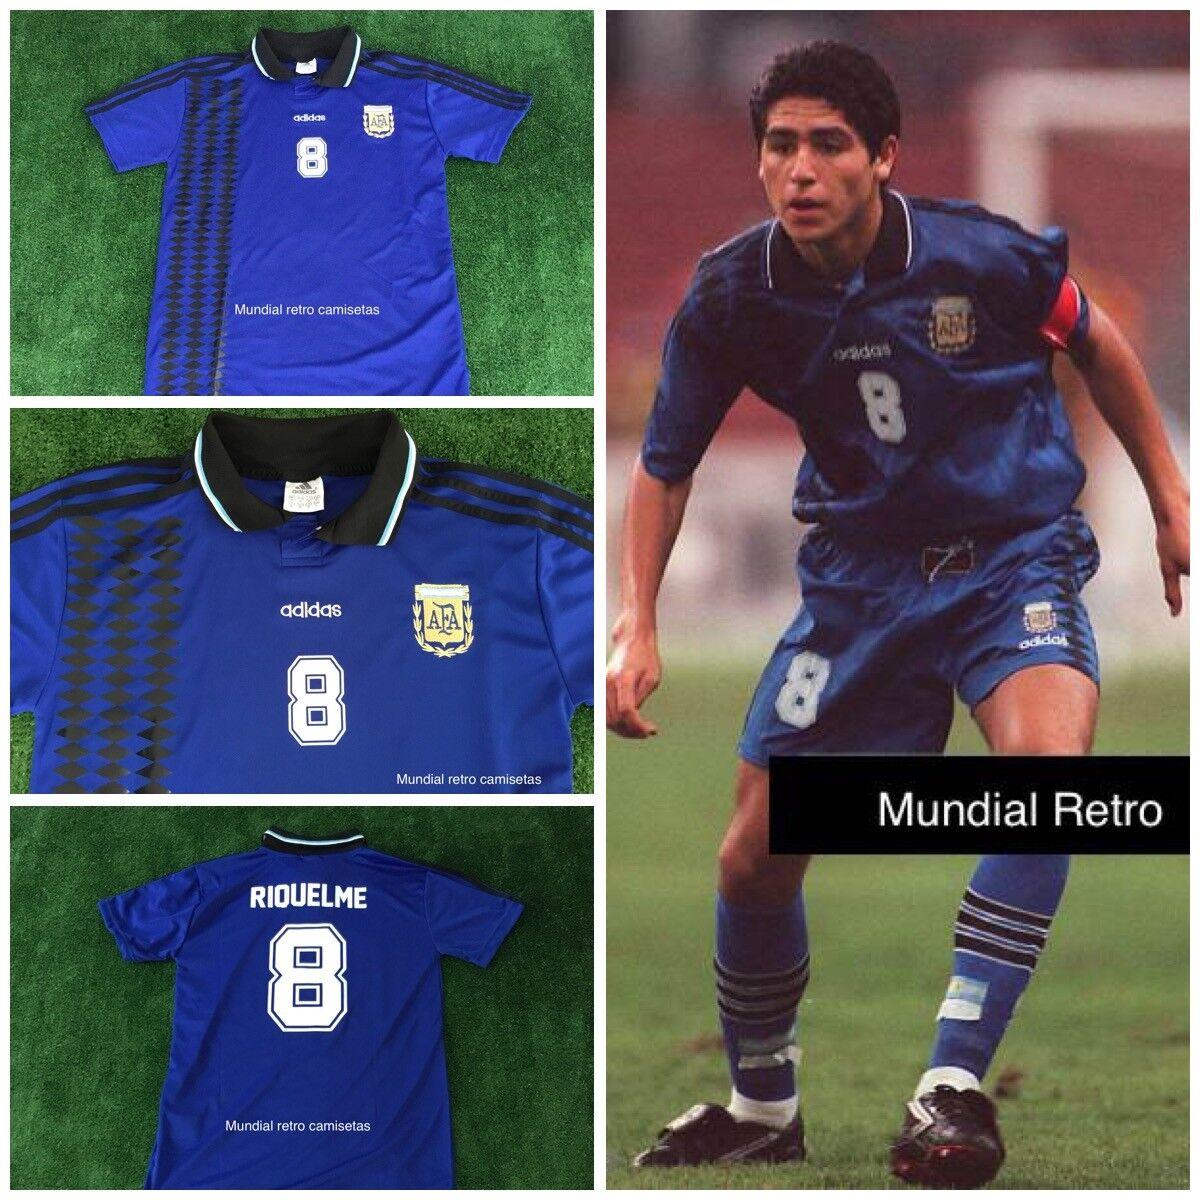 Riquelme argentooina world cup Malaysia 1997 jersey maglia camiseta replica